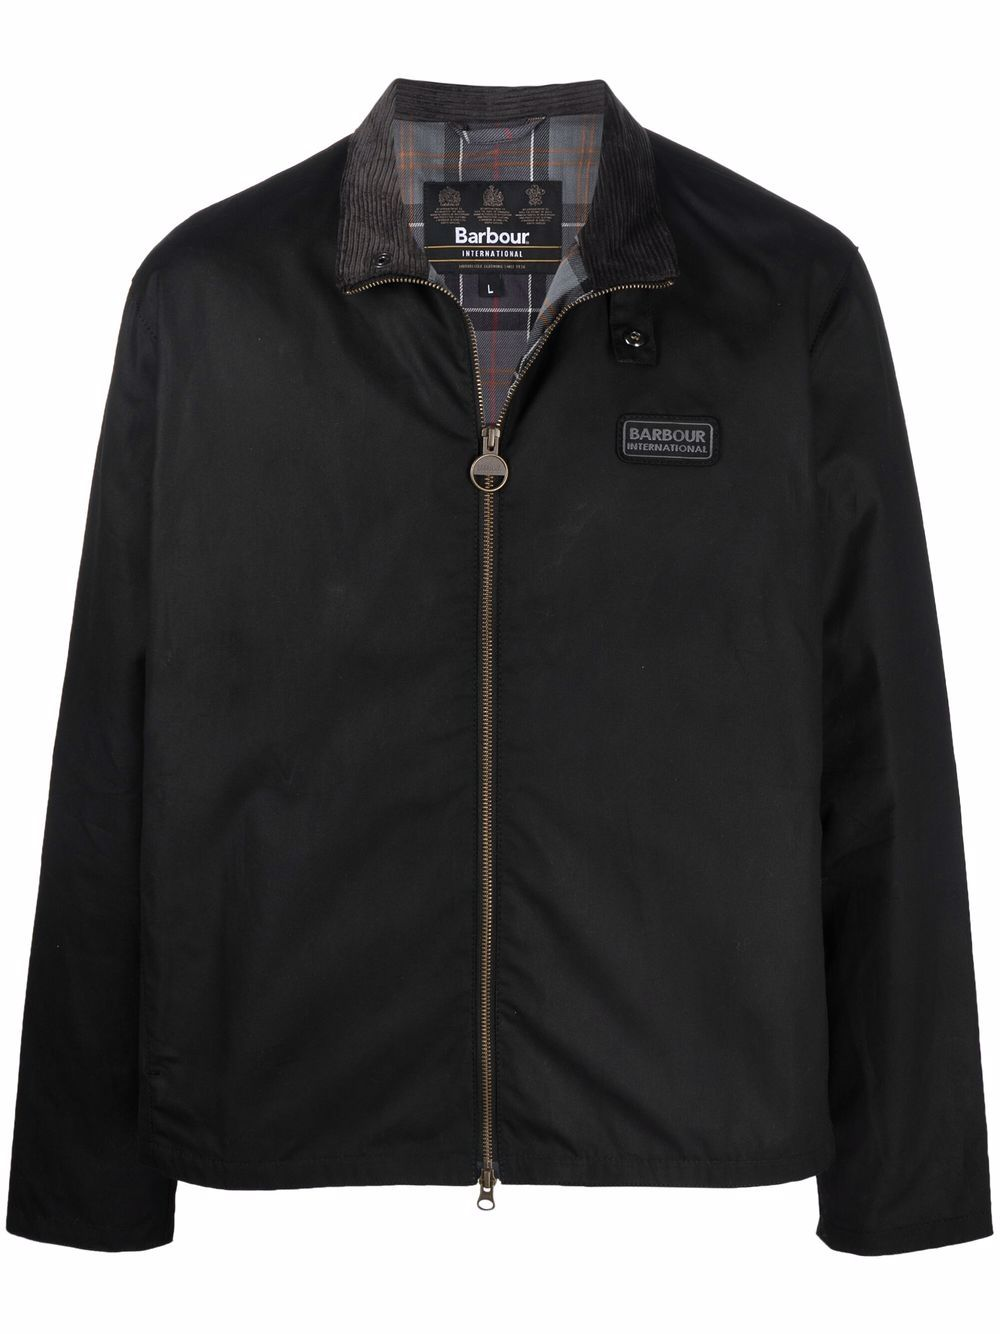 intl mind jacket man black BARBOUR | Jackets | MWX1905BK71